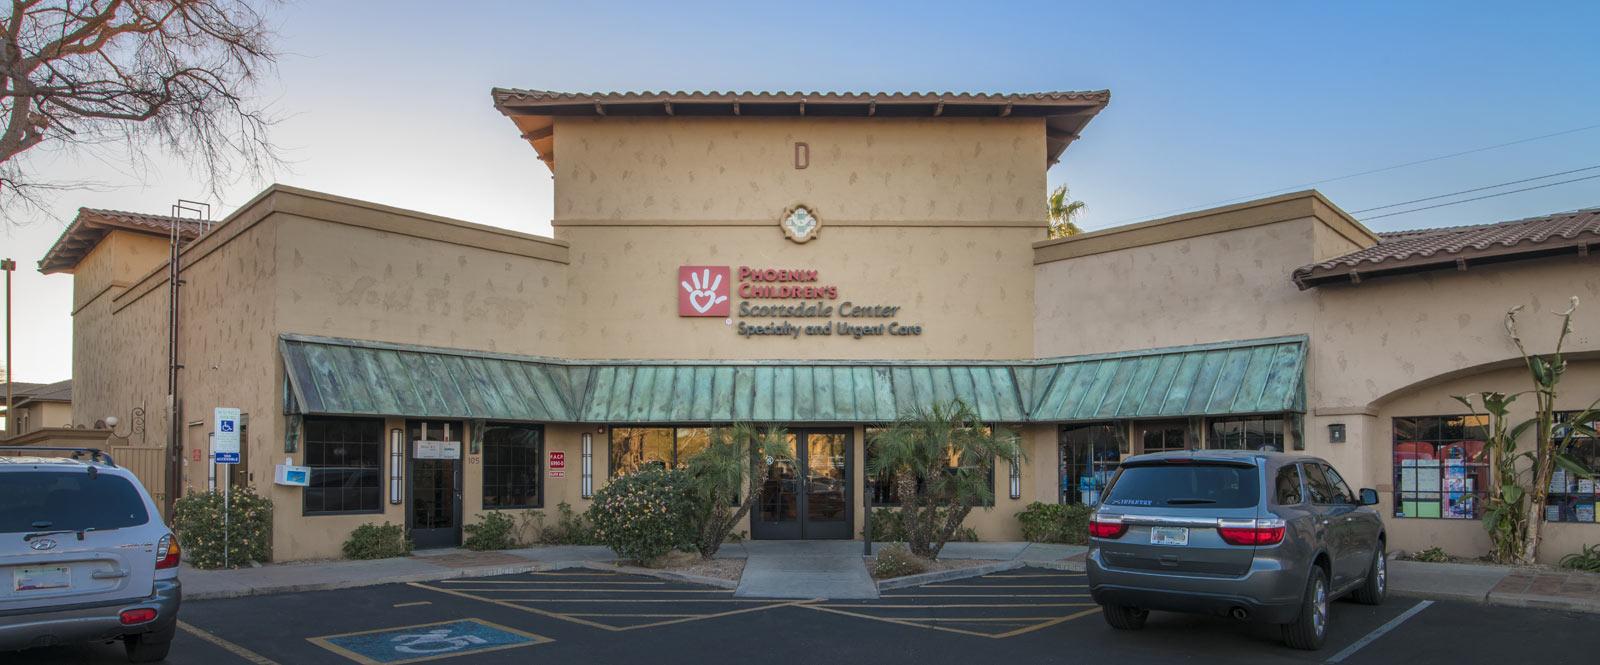 Scottsdale Specialty Care Center   Phoenix Children's Hospital